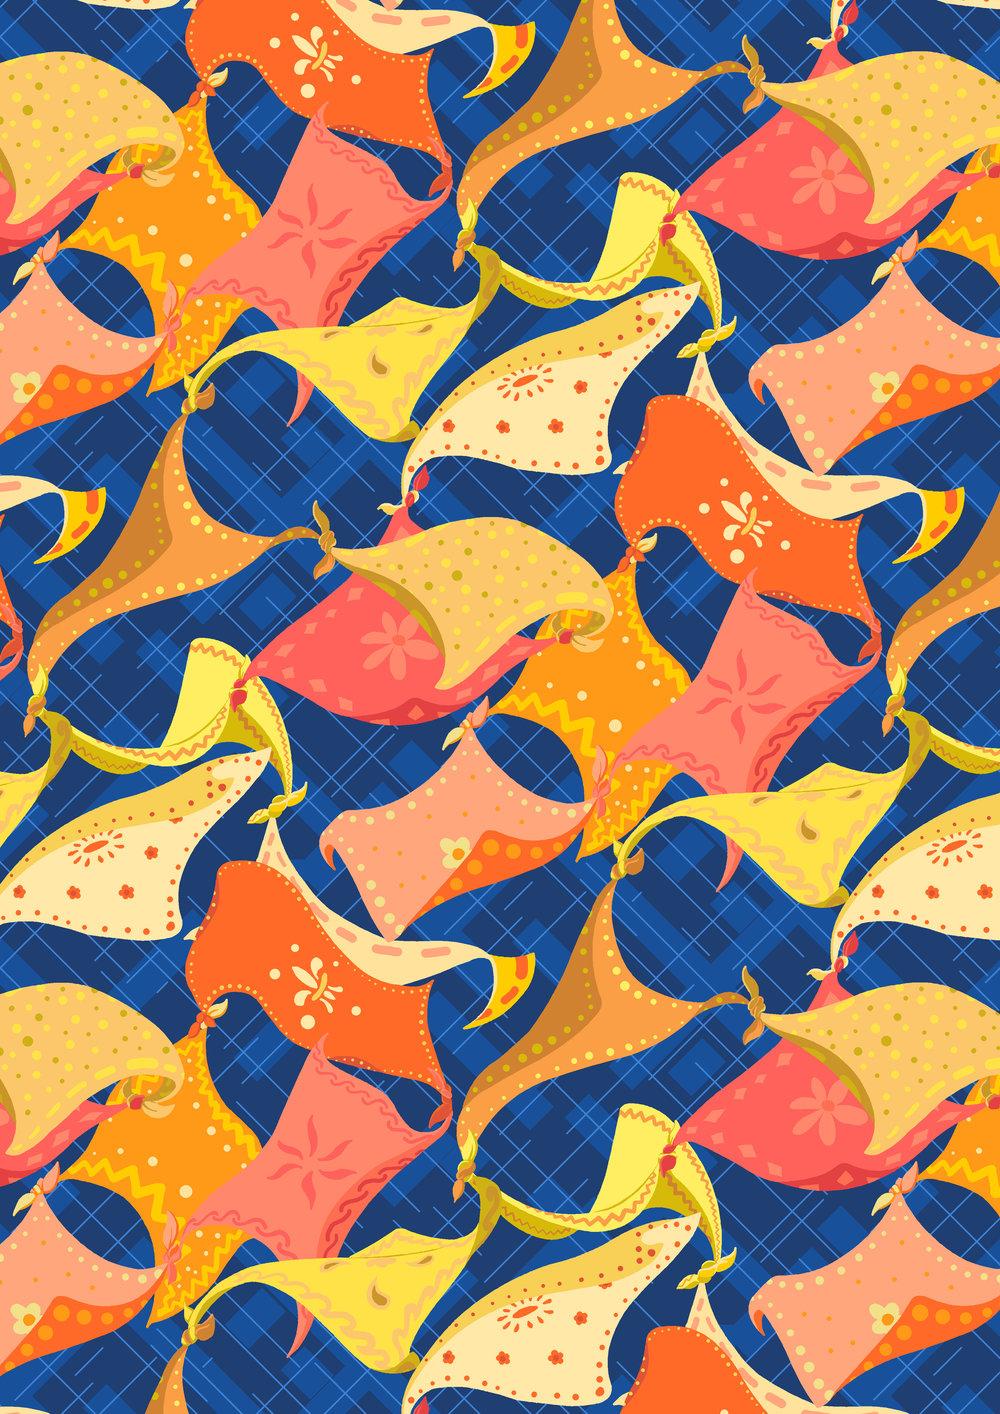 Scarf Dance - Tales of Legacy - Liberty Fabrics